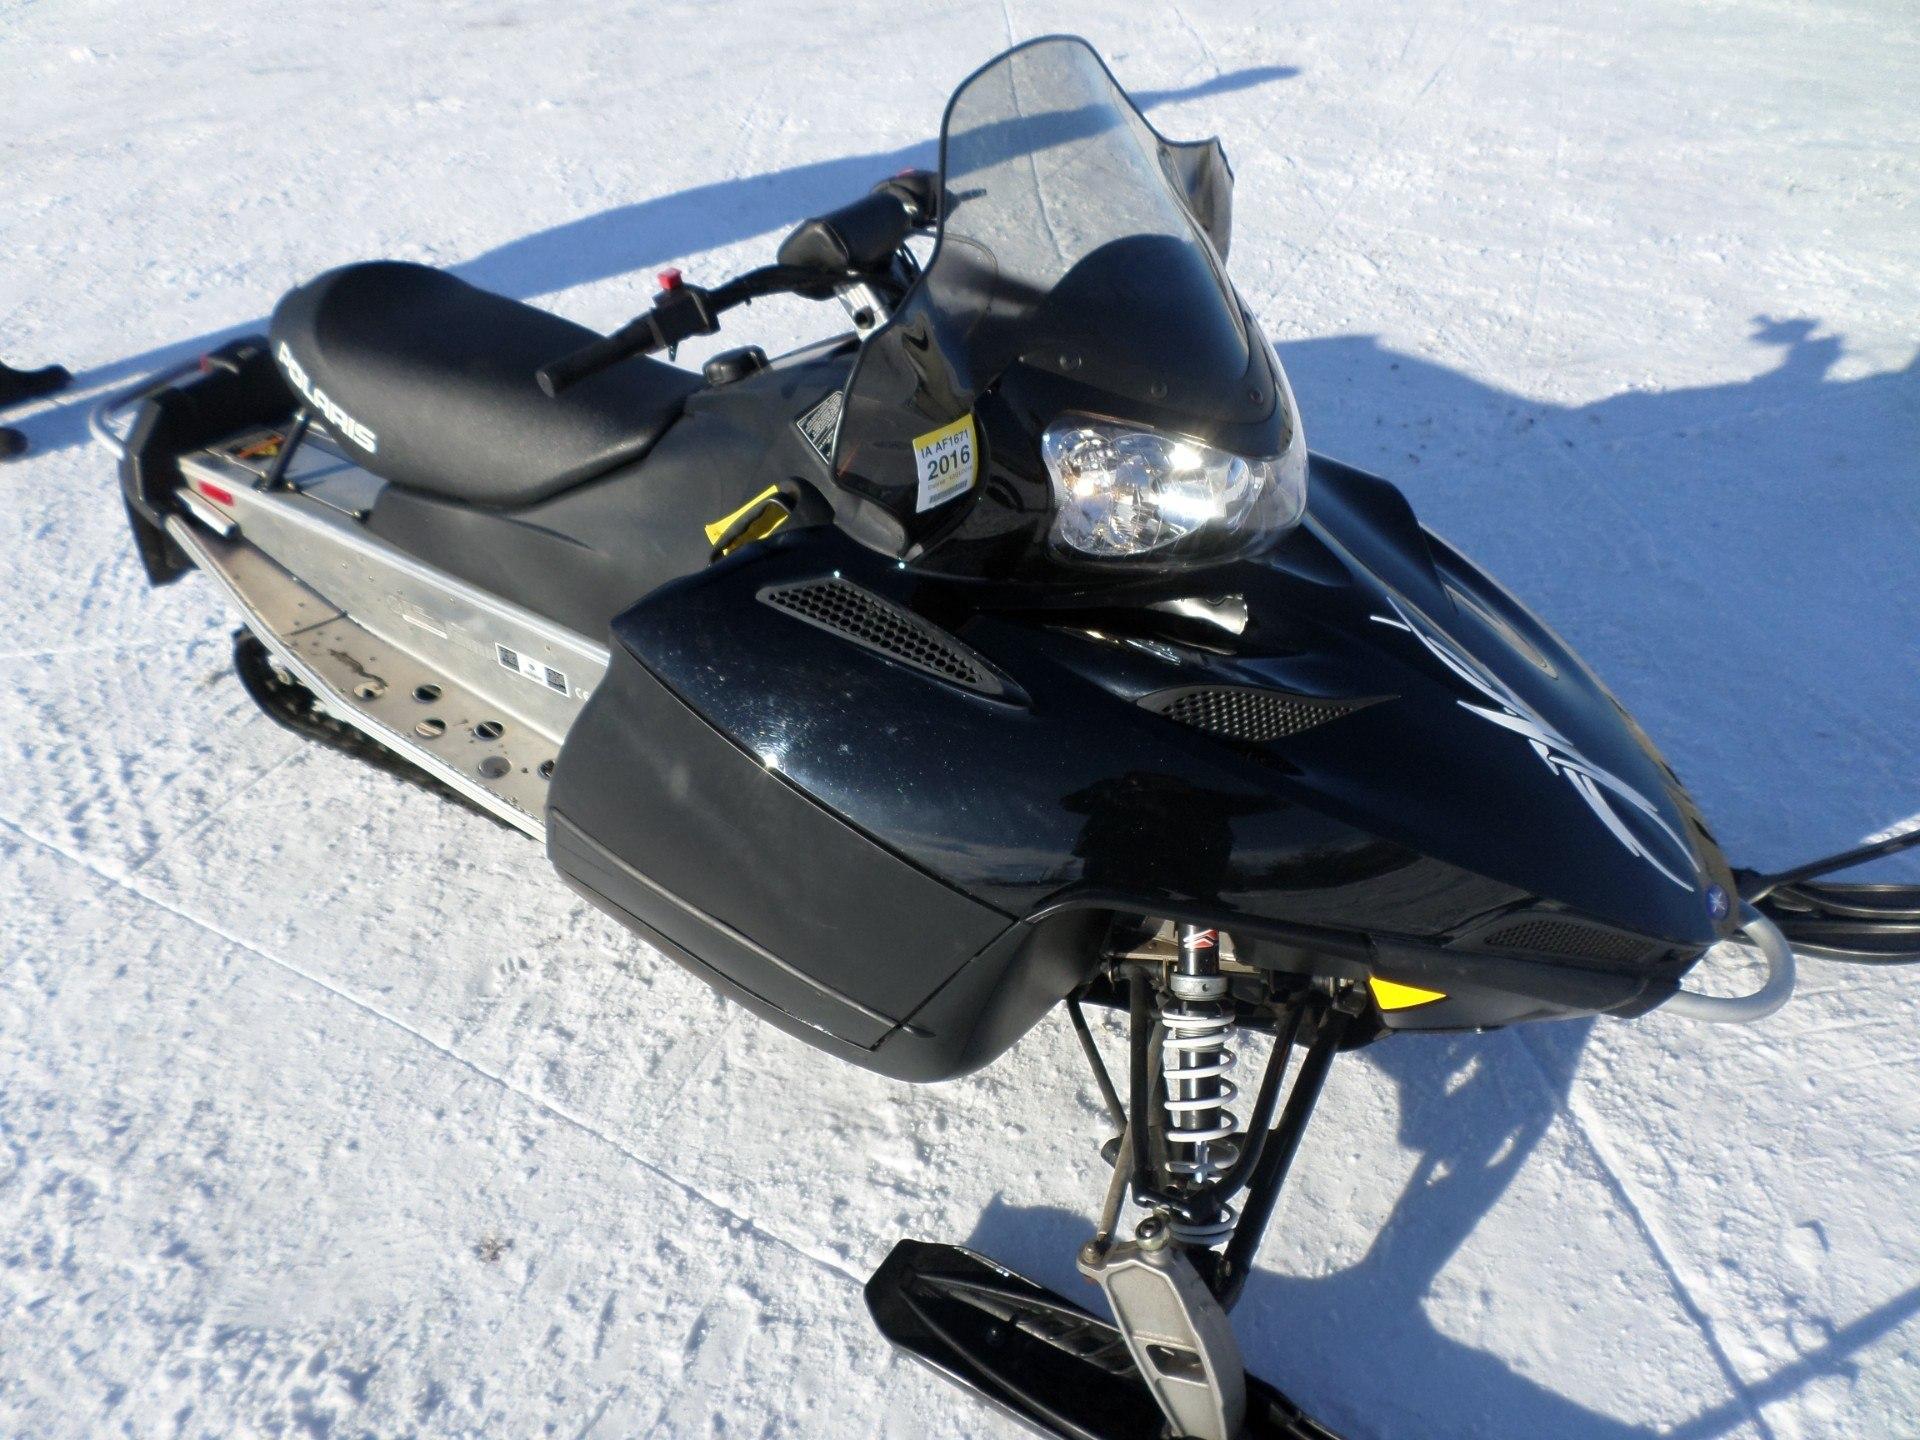 2010 Polaris 600 IQ Shift for sale 302